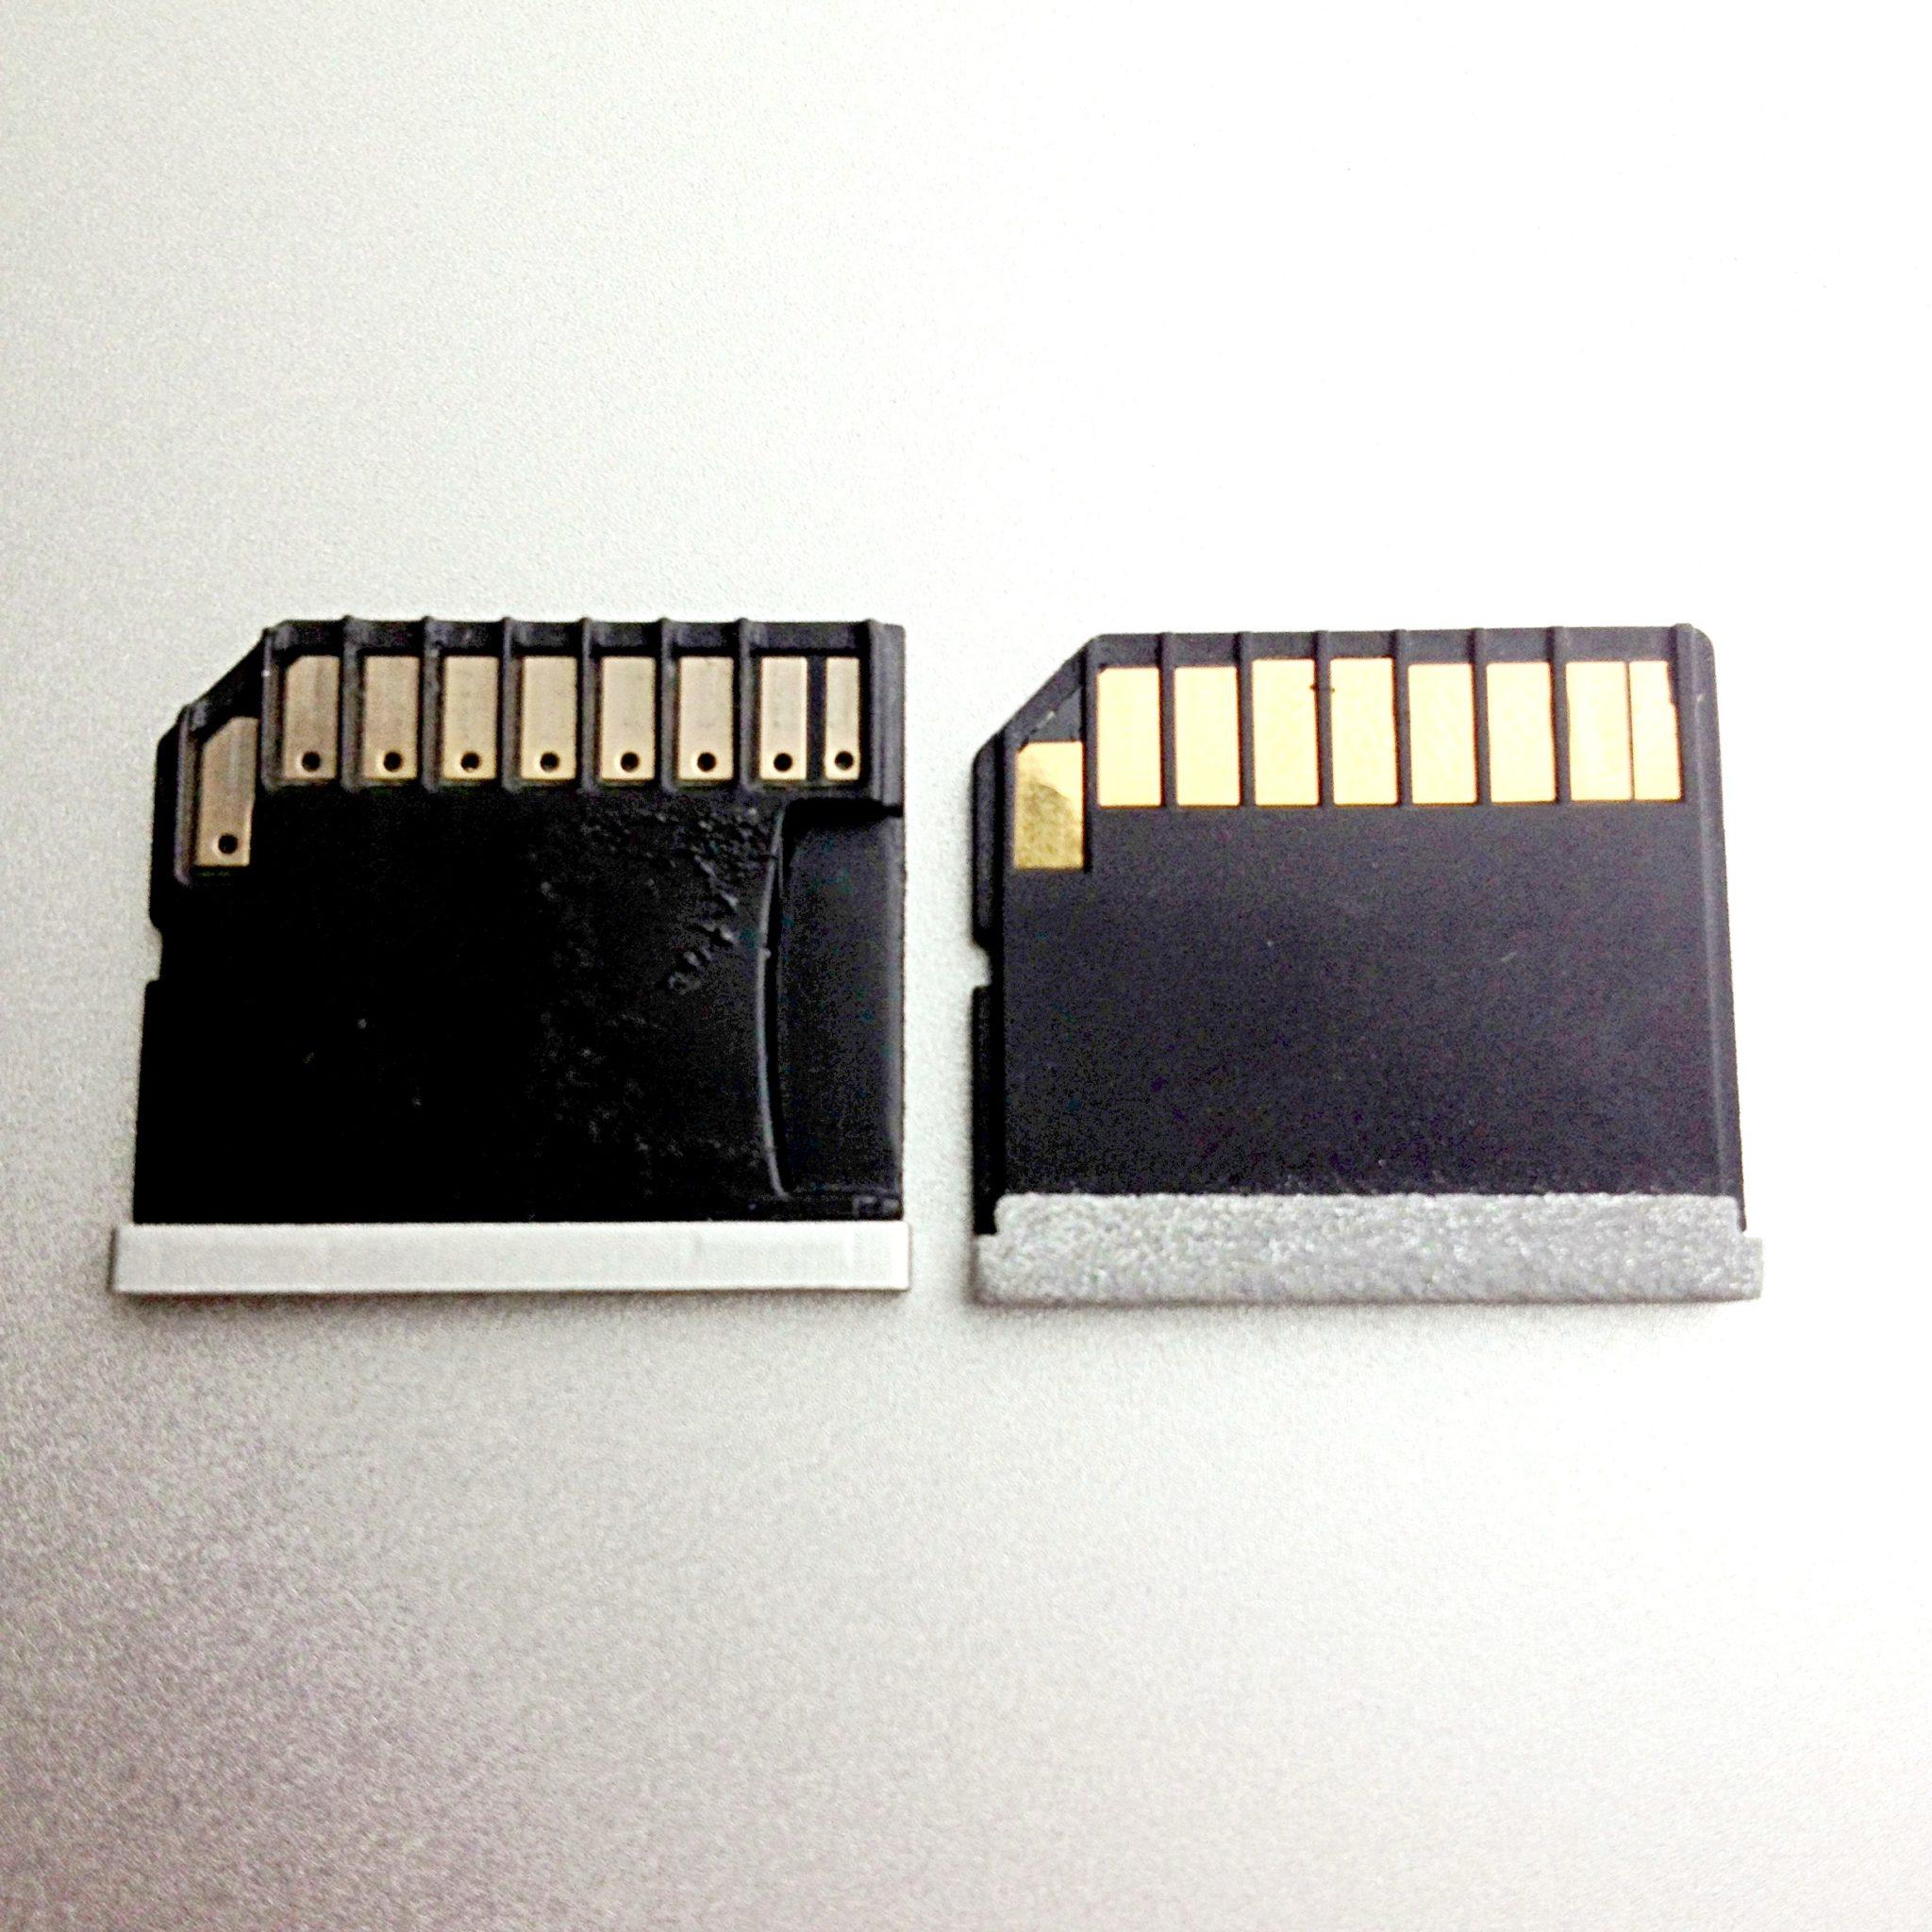 MiniDrive vs Nifty - Back View